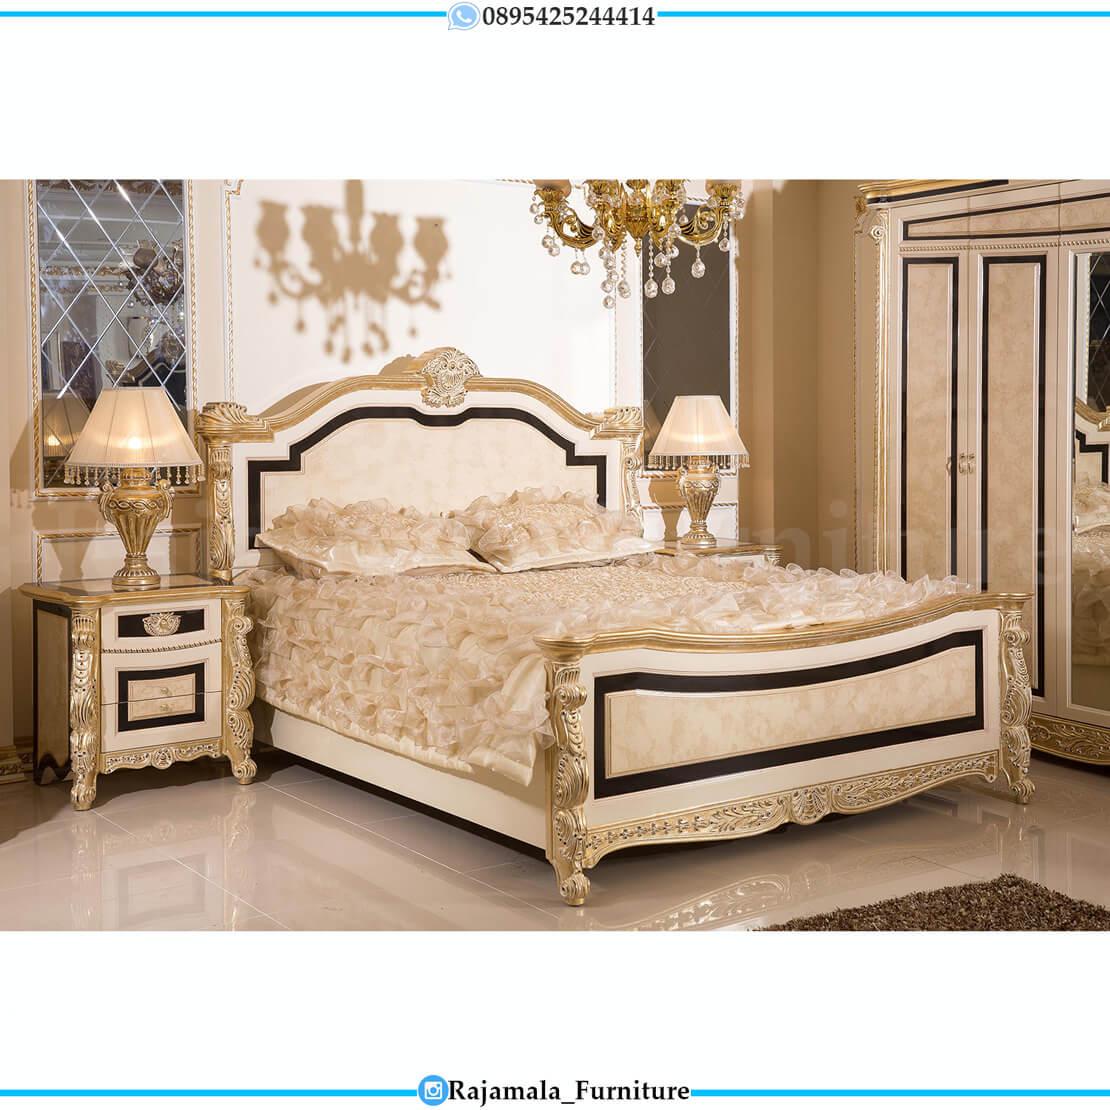 Tempat Tidur Mewah Ukiran Jepara Luxury Classic Carving Greatest RM-0225